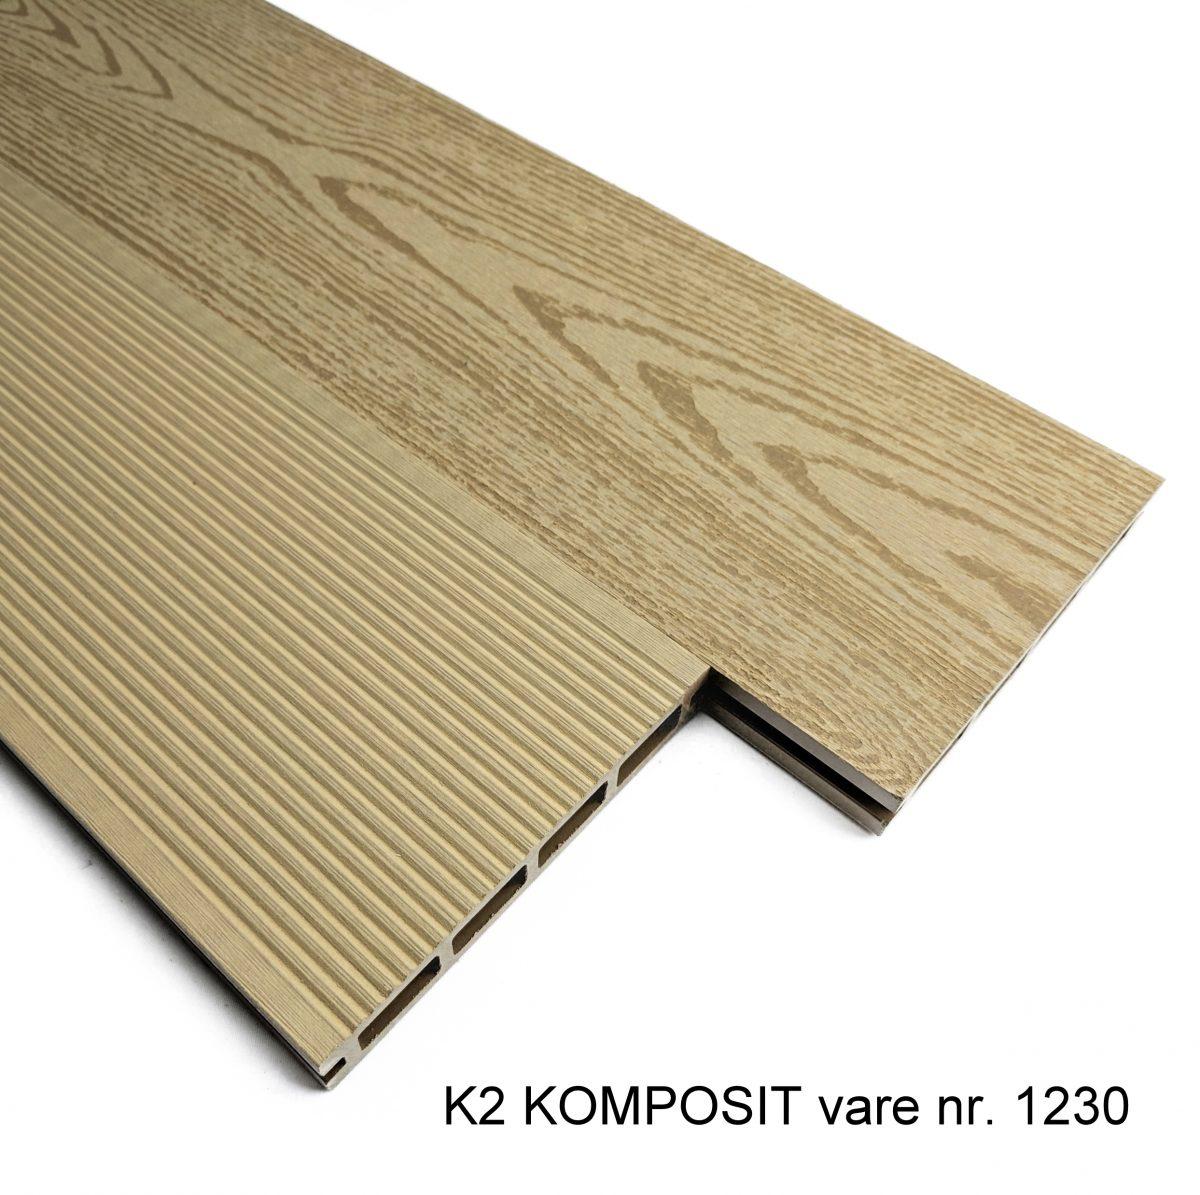 Picture of: K2 Komposit Terrassebraedder Lys Eg Sw 25x150x2220 Mm Borstet Rillet Glat Traestruktur K2 Komposit